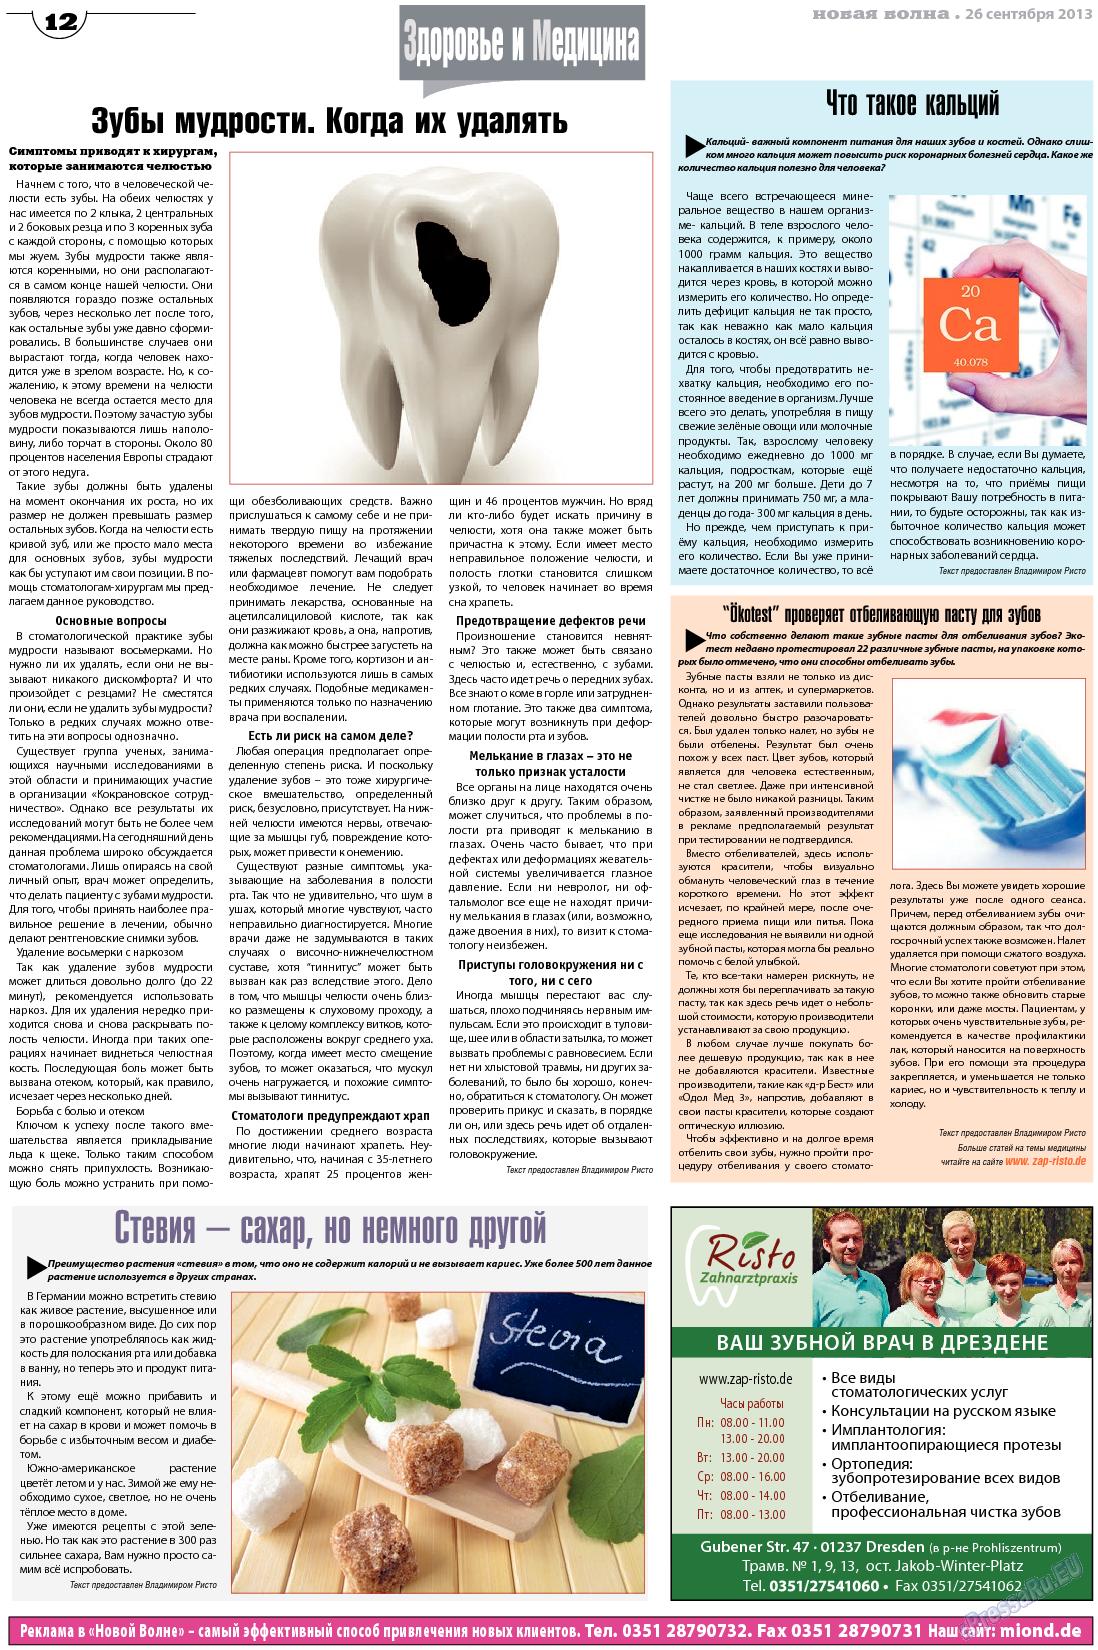 Новая Wолна (газета). 2013 год, номер 39, стр. 12